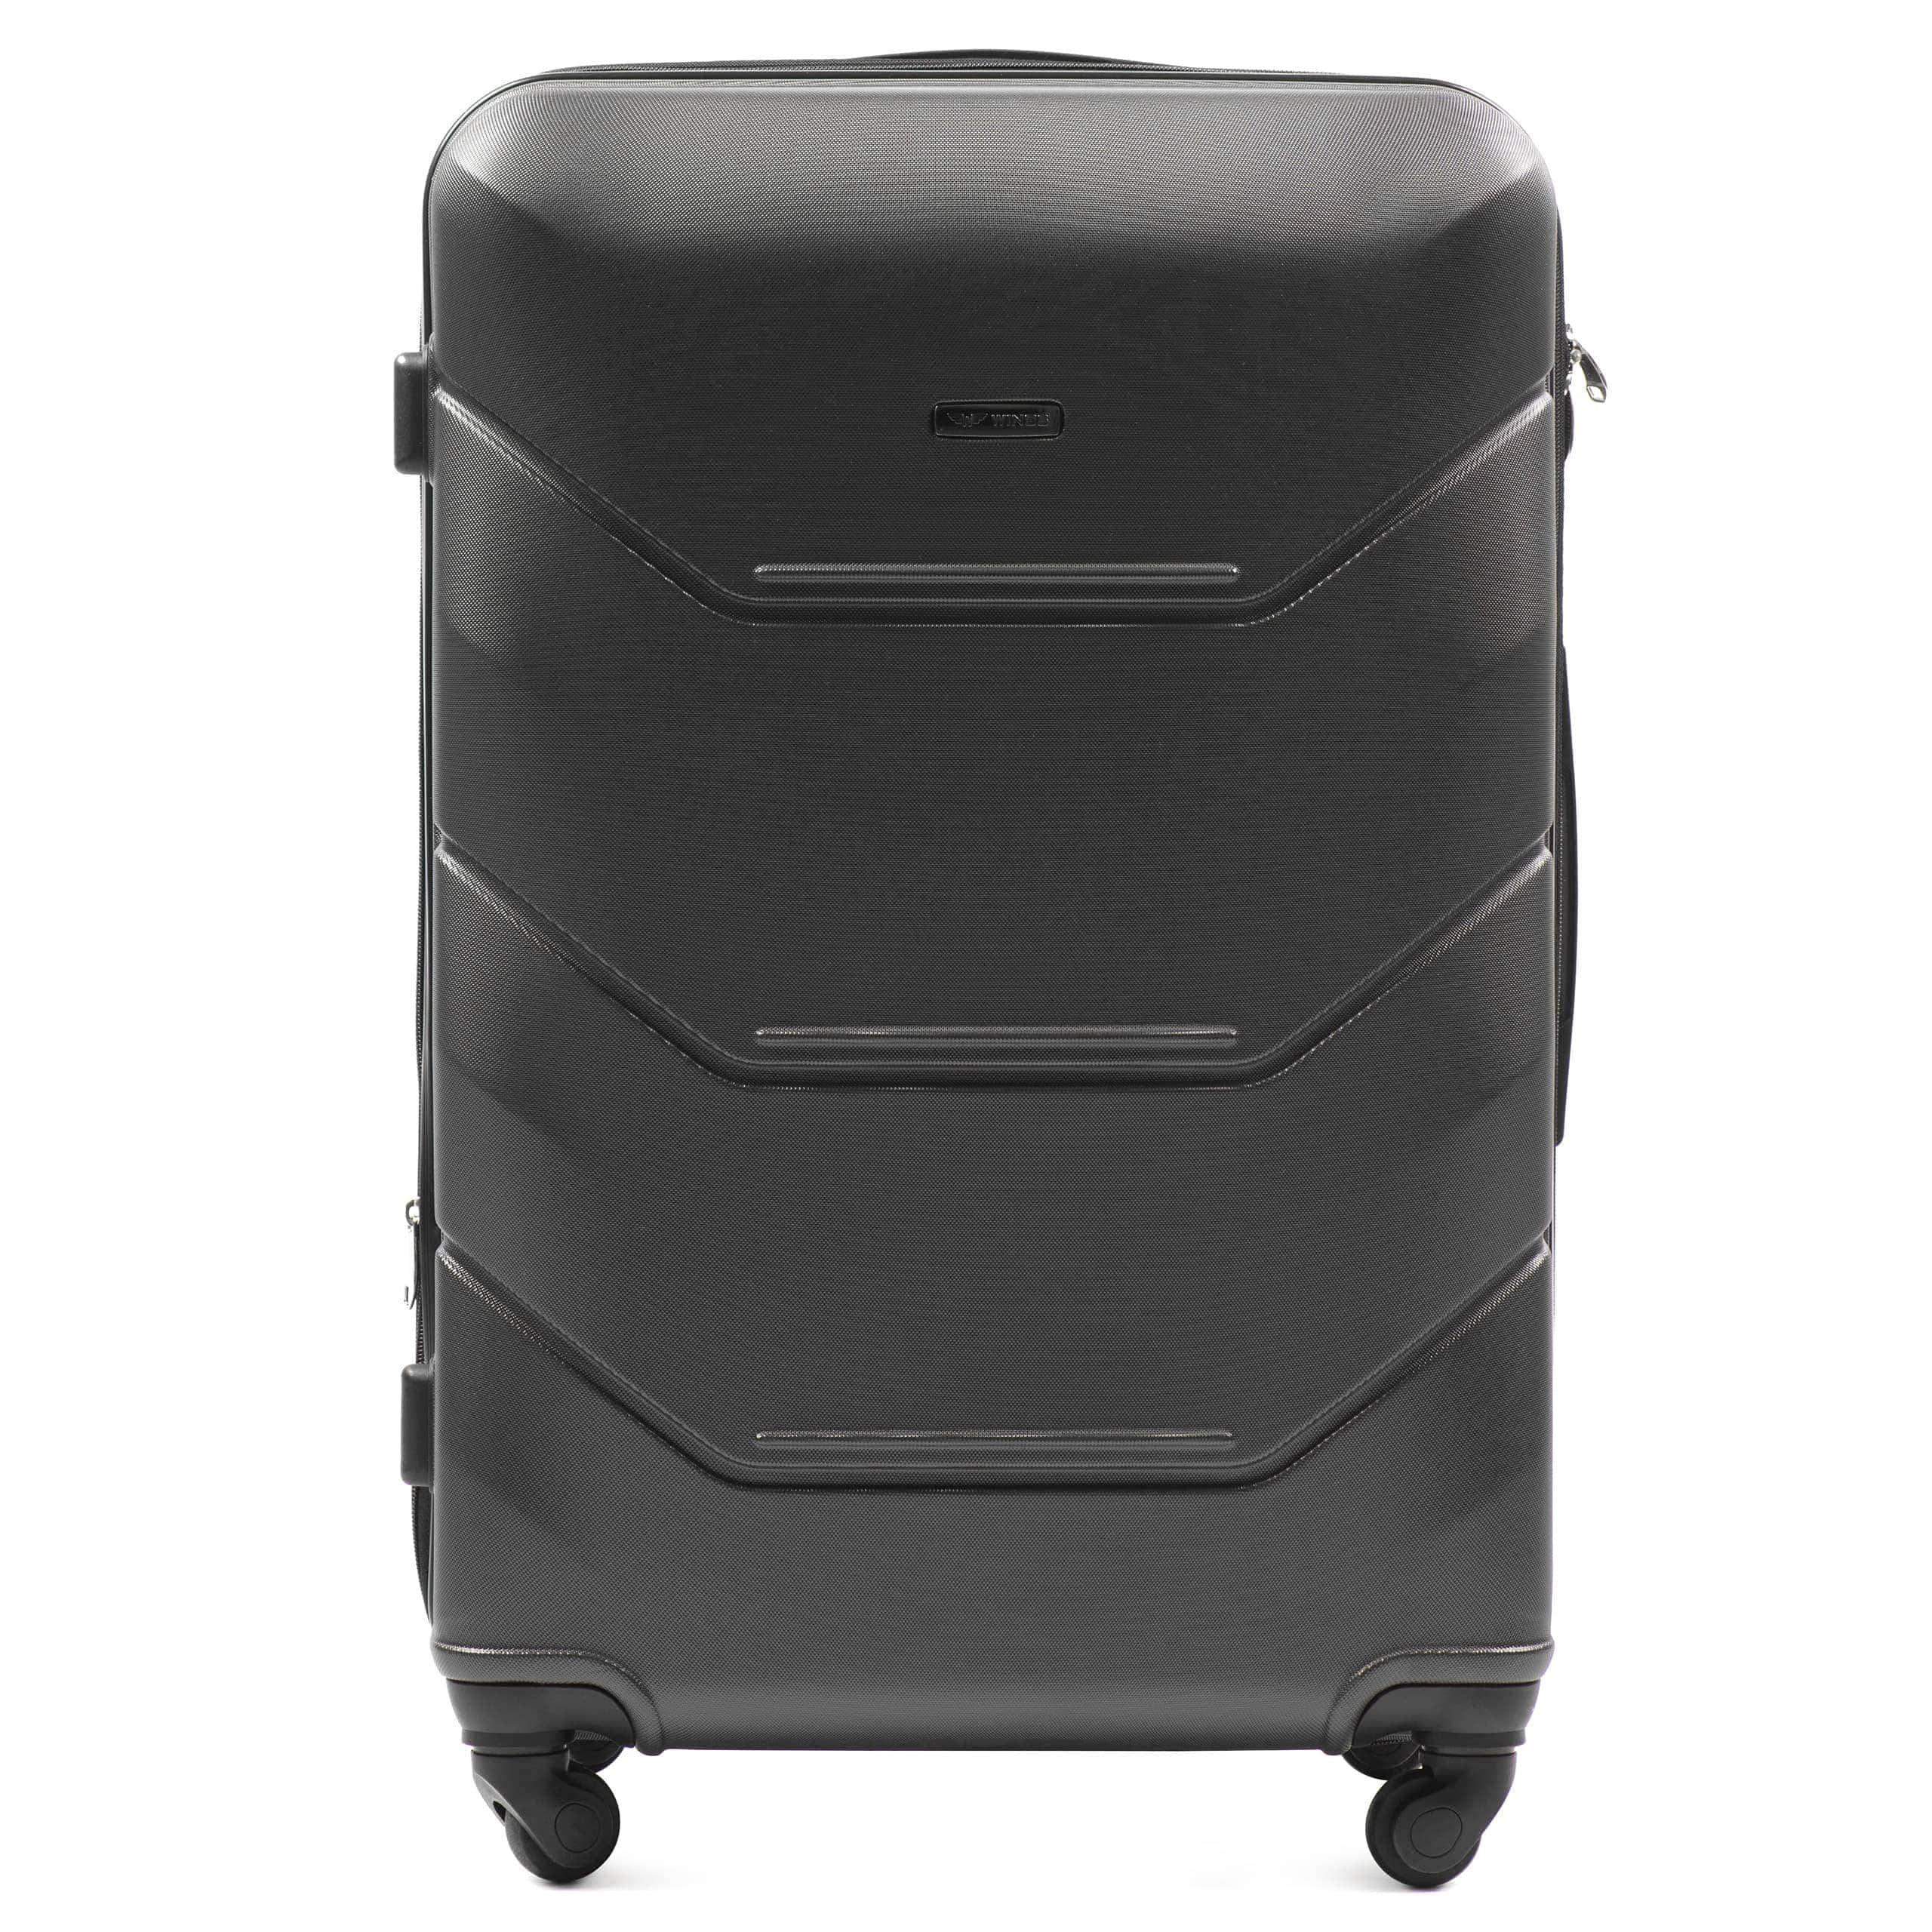 Valiza mare WINGS 147 L DARK GREY Premium pe 4 roti din cauciuc!Pt bagaj,pina la 23 kg